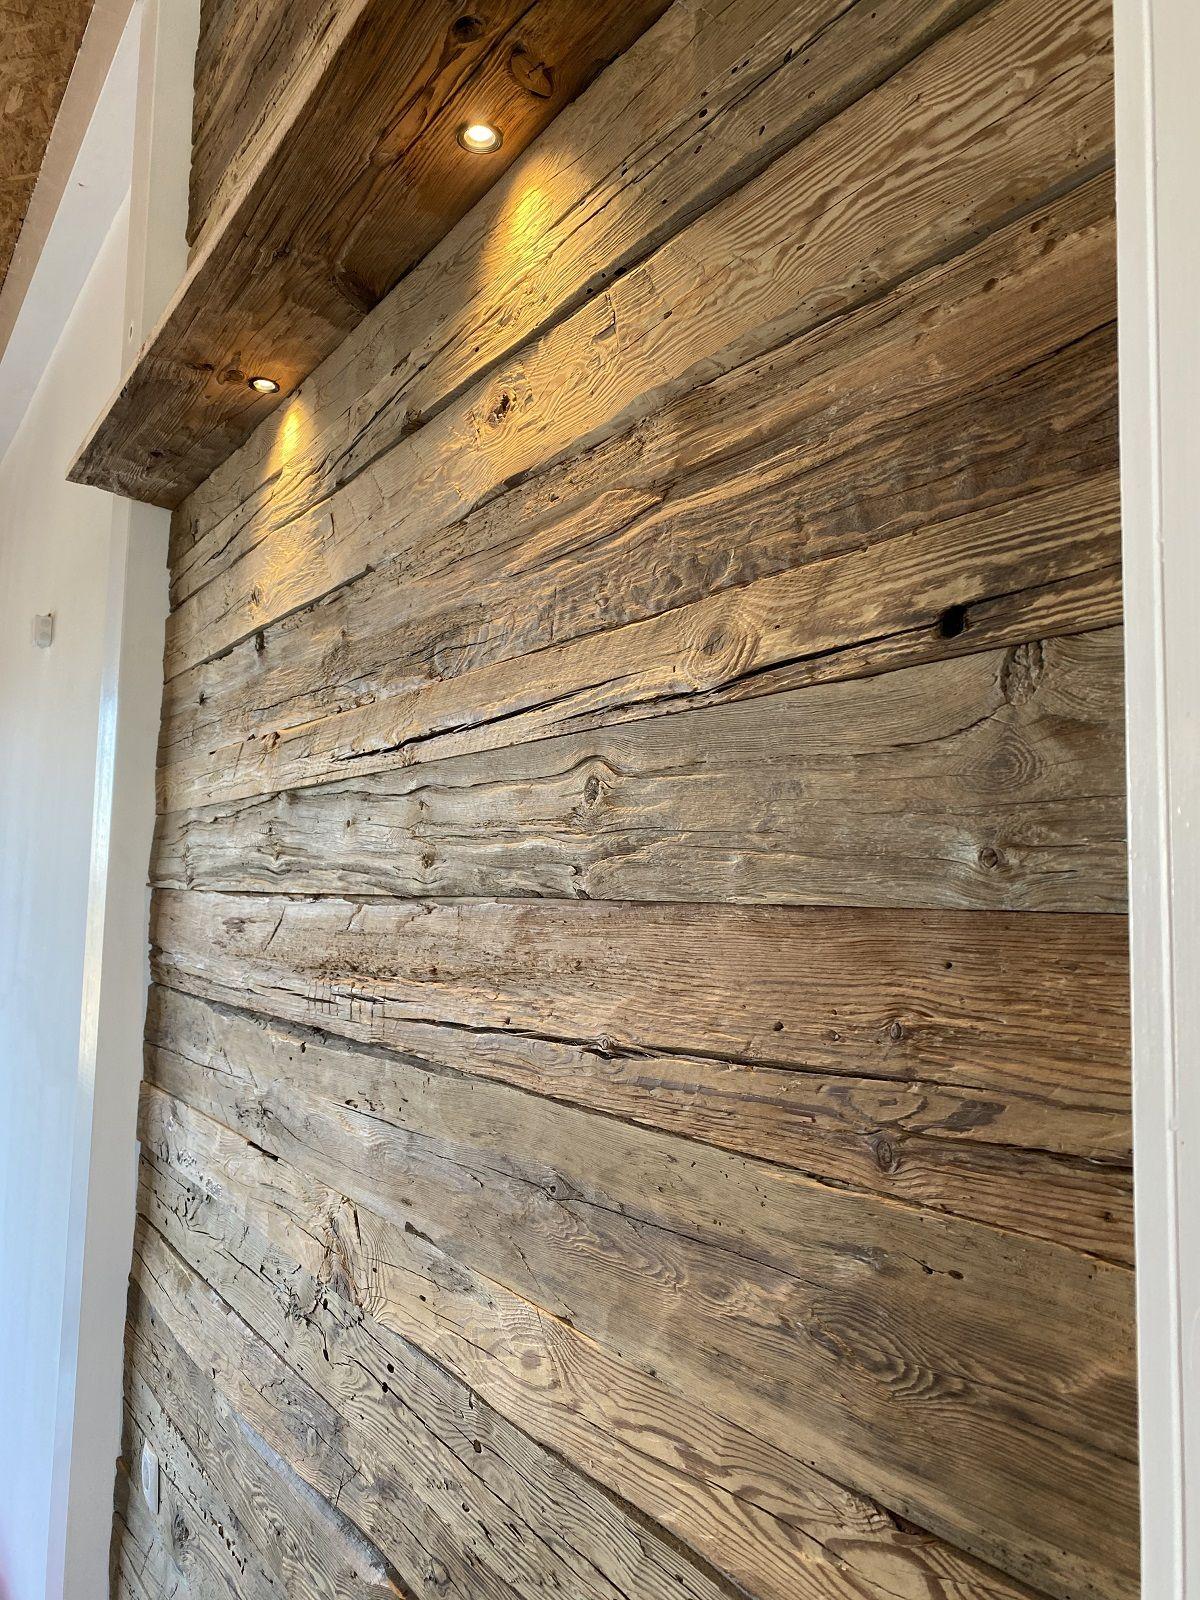 Rustikale Wandverkleidung Handgehackte Altholz Bretter Vintage Holz In 2020 Altholz Wandverkleidung Wandverkleidung Holz Wandverkleidung